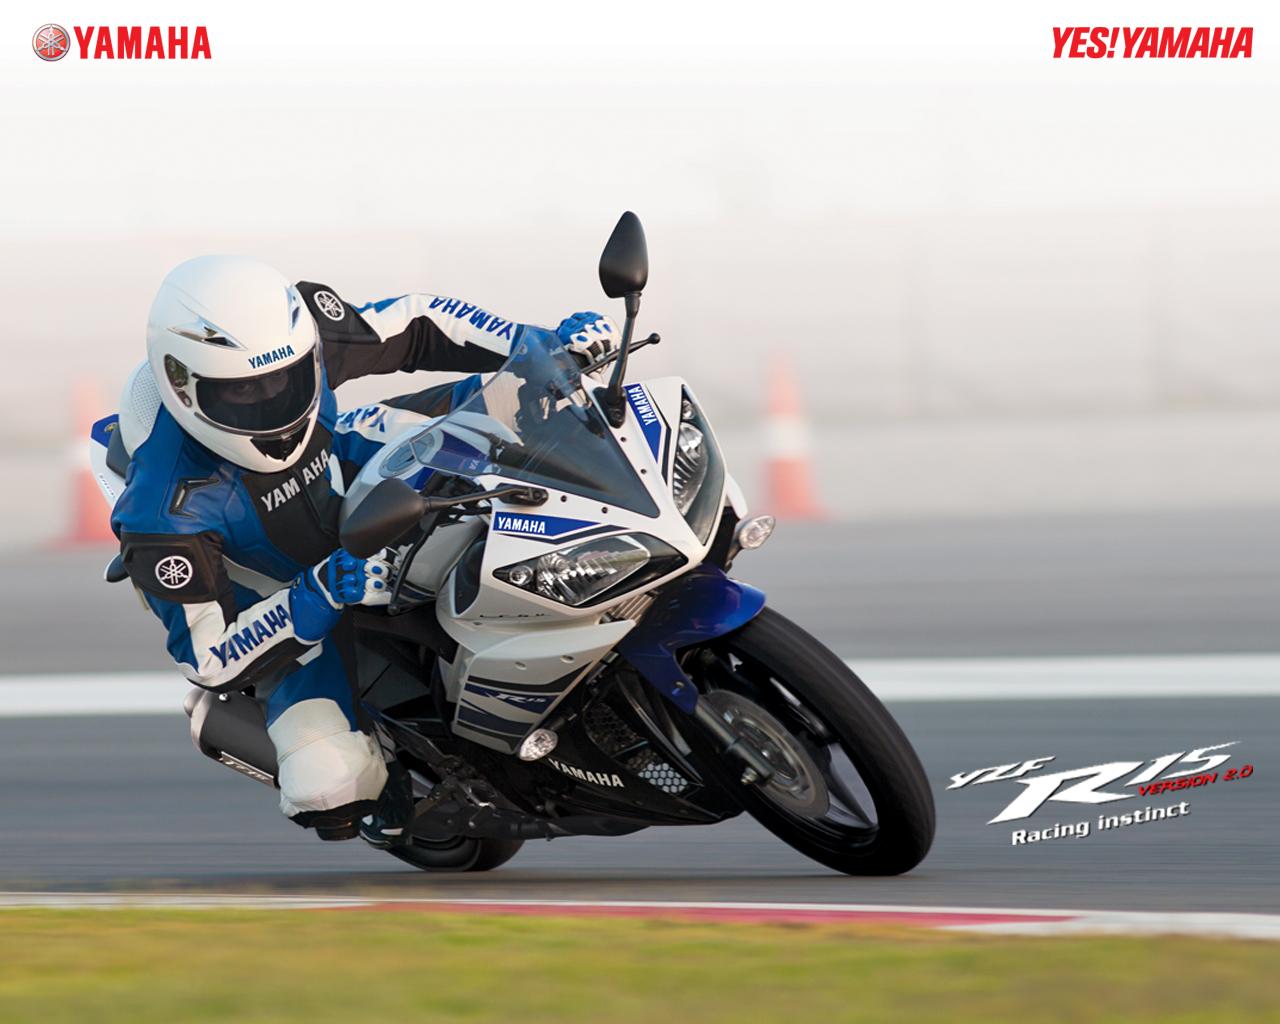 R15 Yamaha Wallpaper 2013 Yamaha R15 - New ...